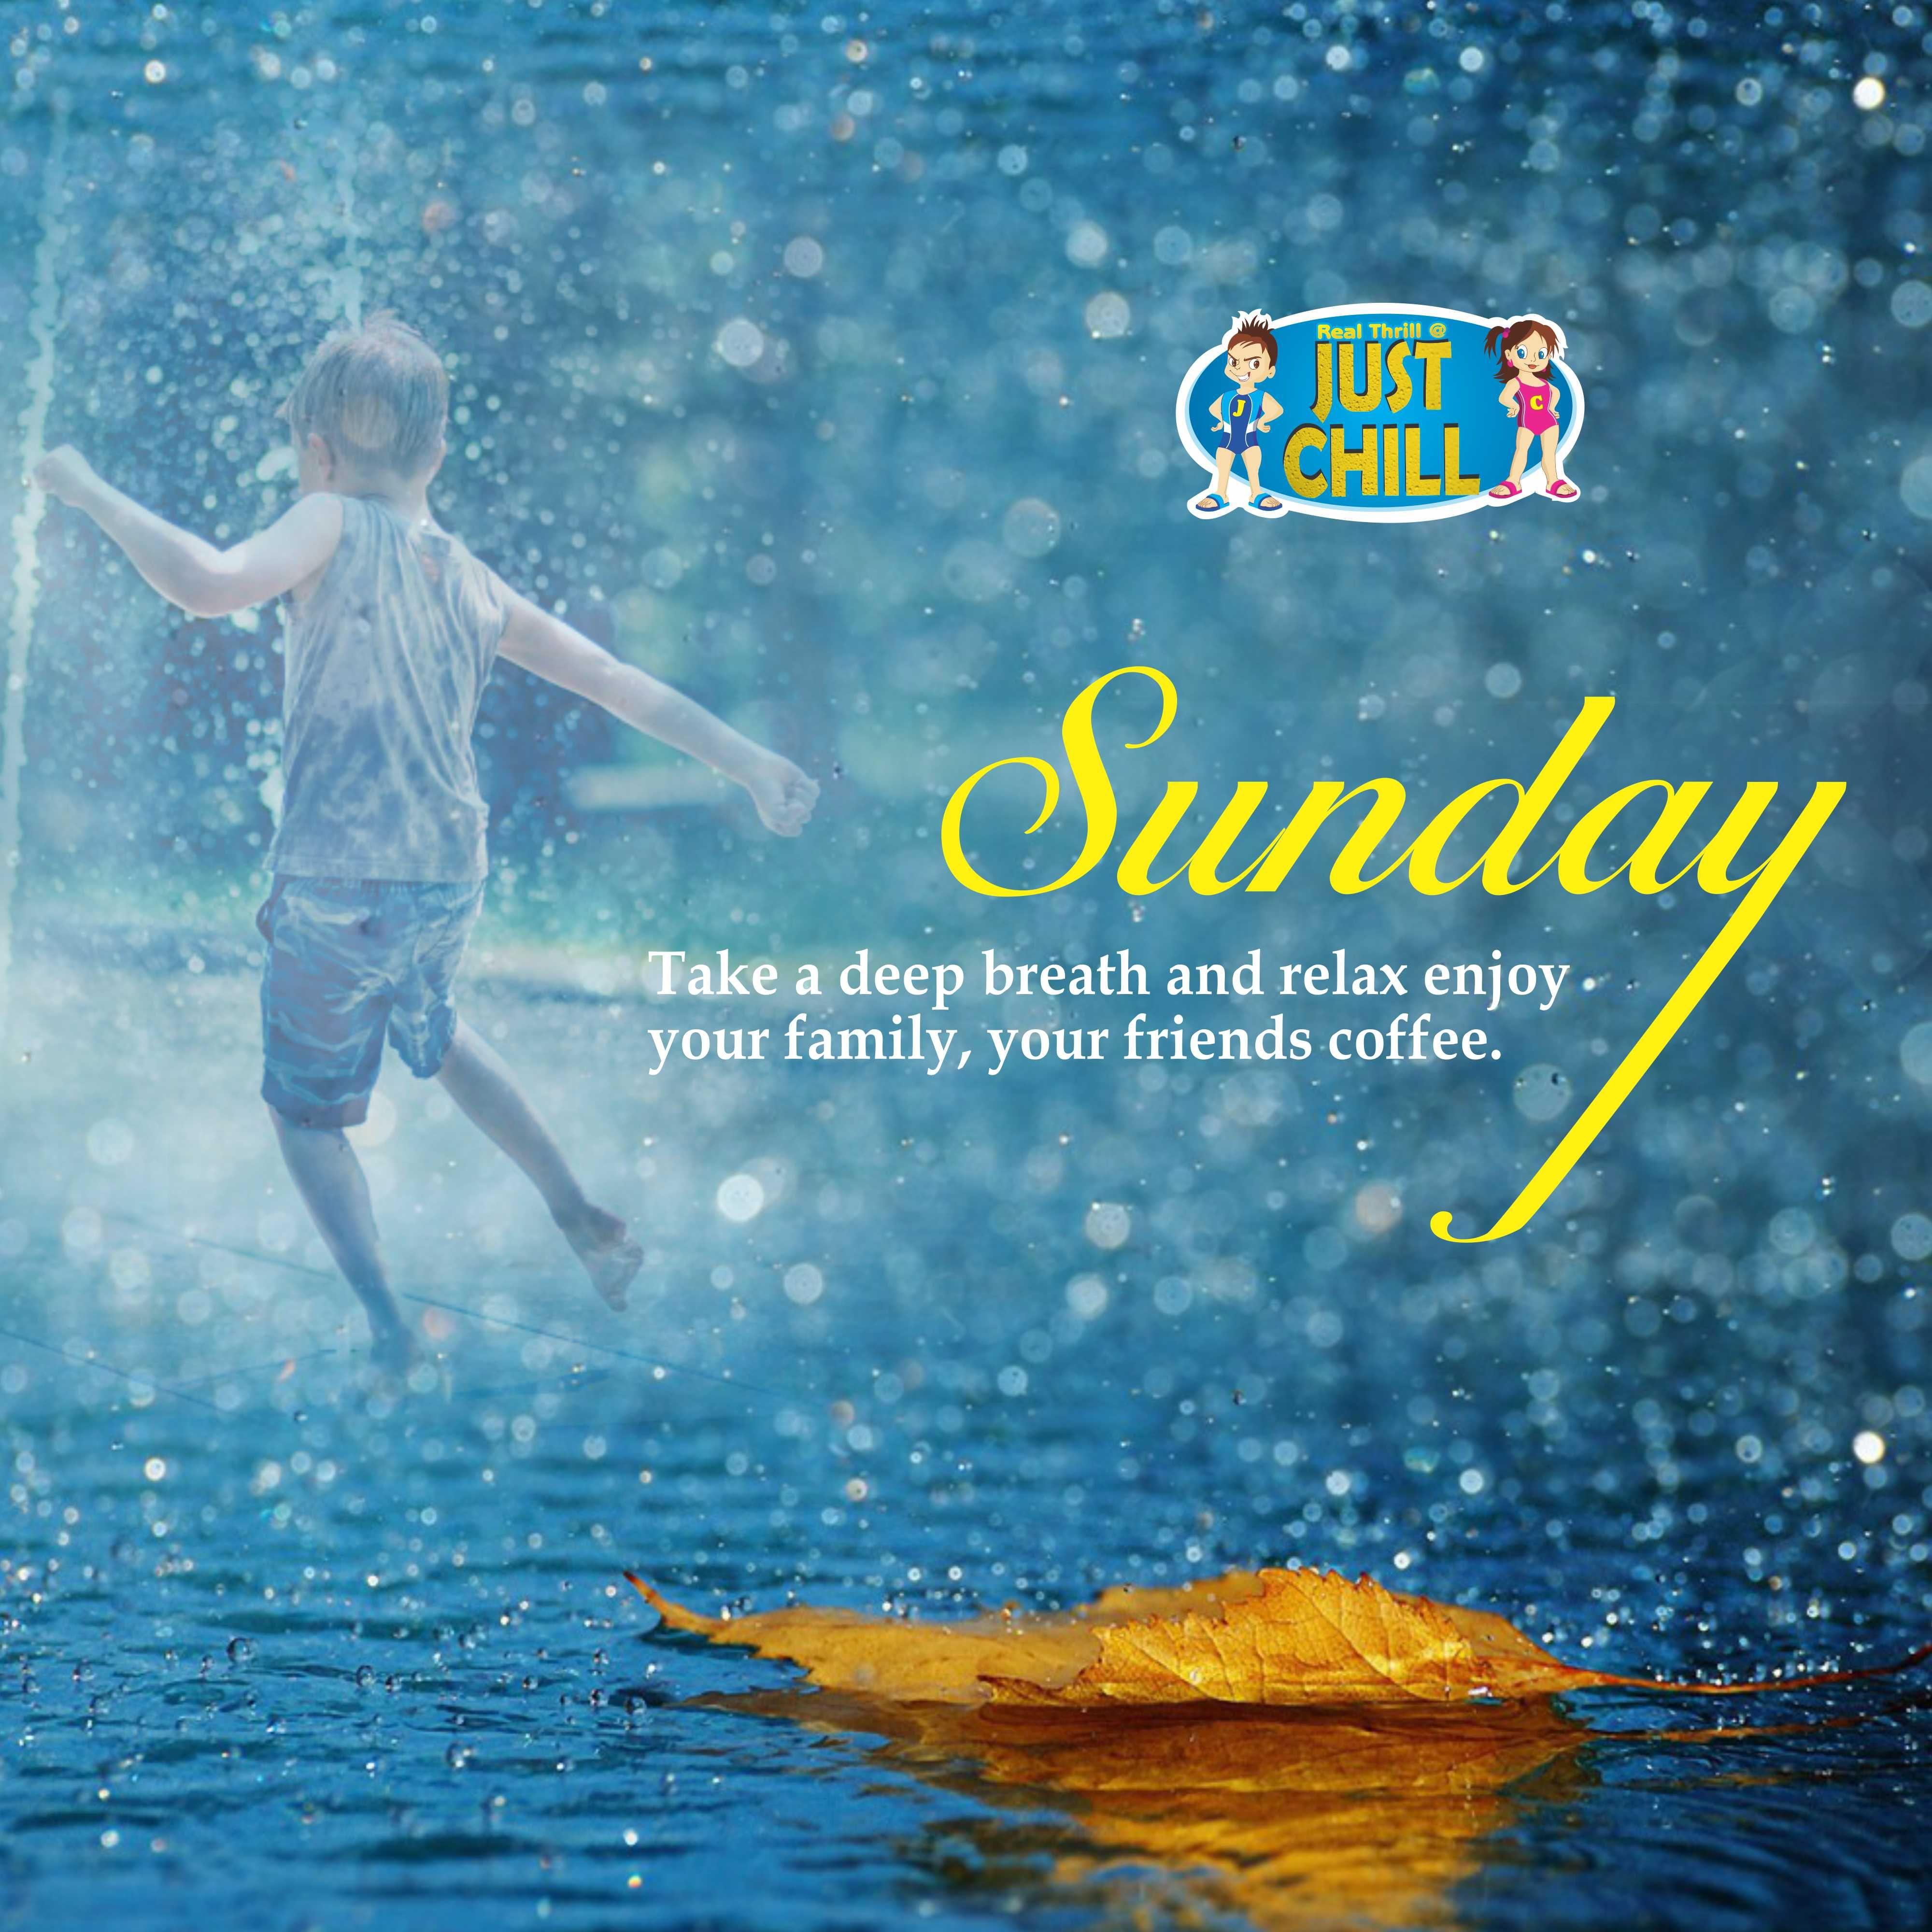 #Justchillwaterpark #Sundayqoute